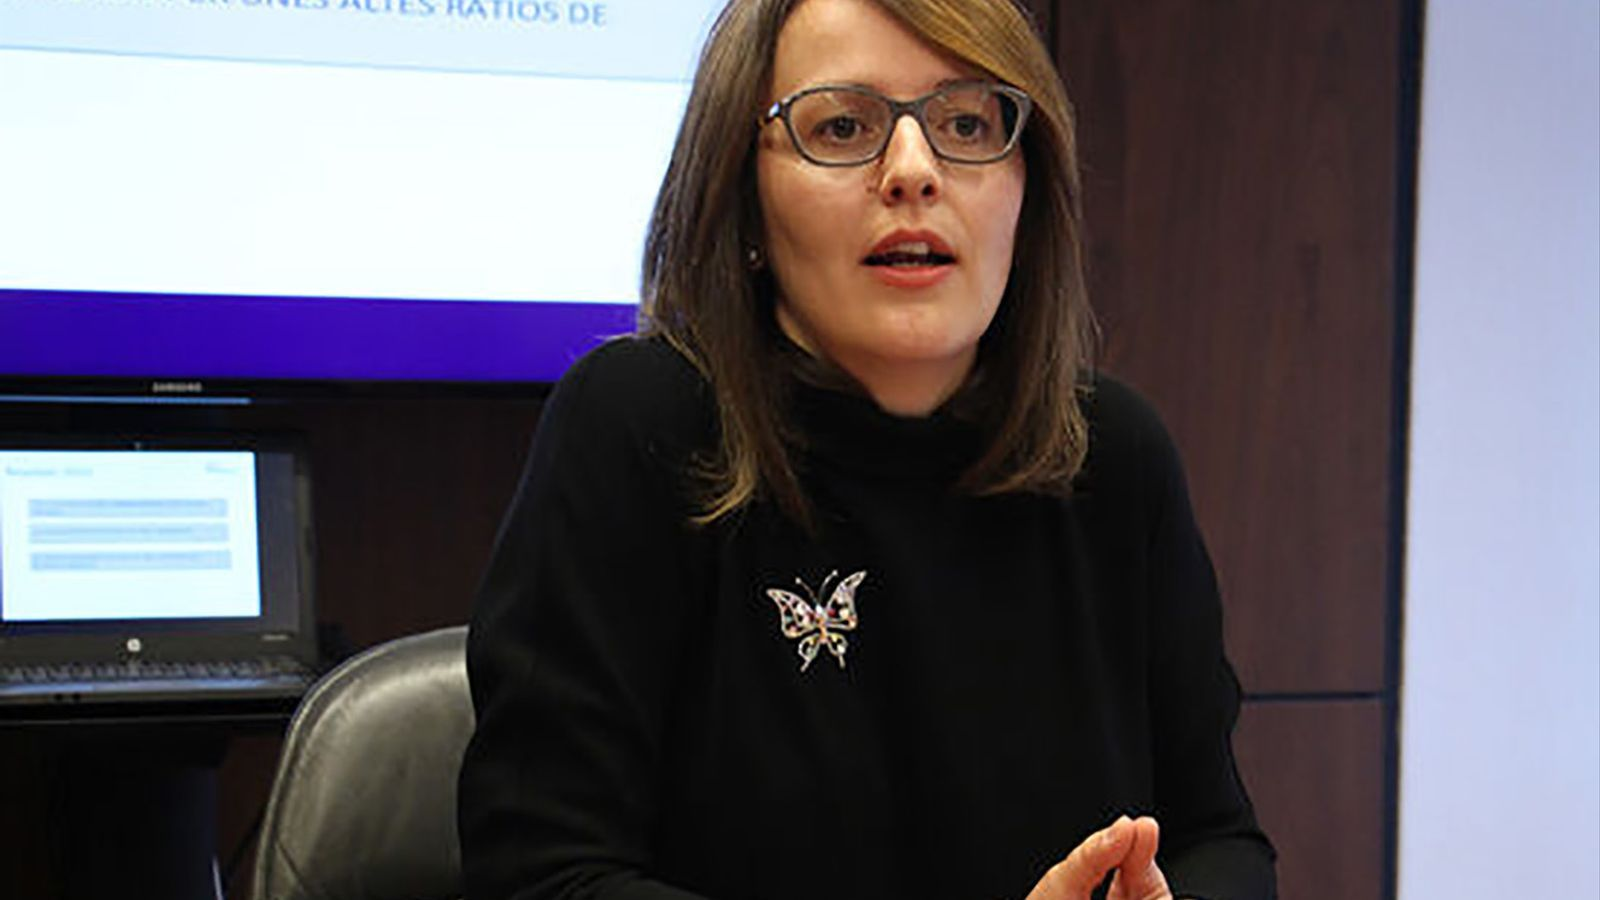 La directora d'Andorran Banking, Esther Puigcercós. / ANA